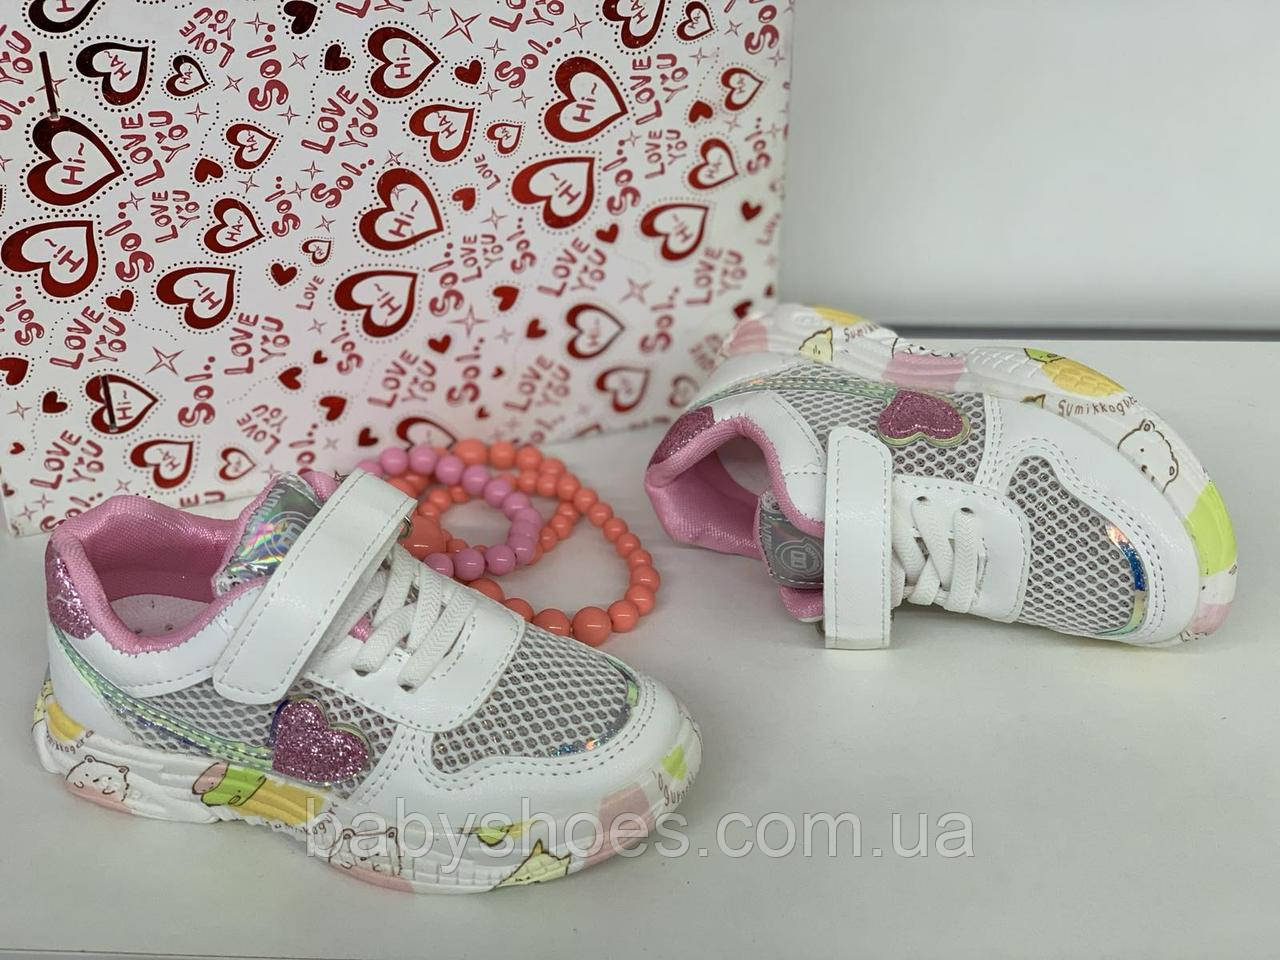 Кроссовки для девочки Violetta р.26-28 КД-370